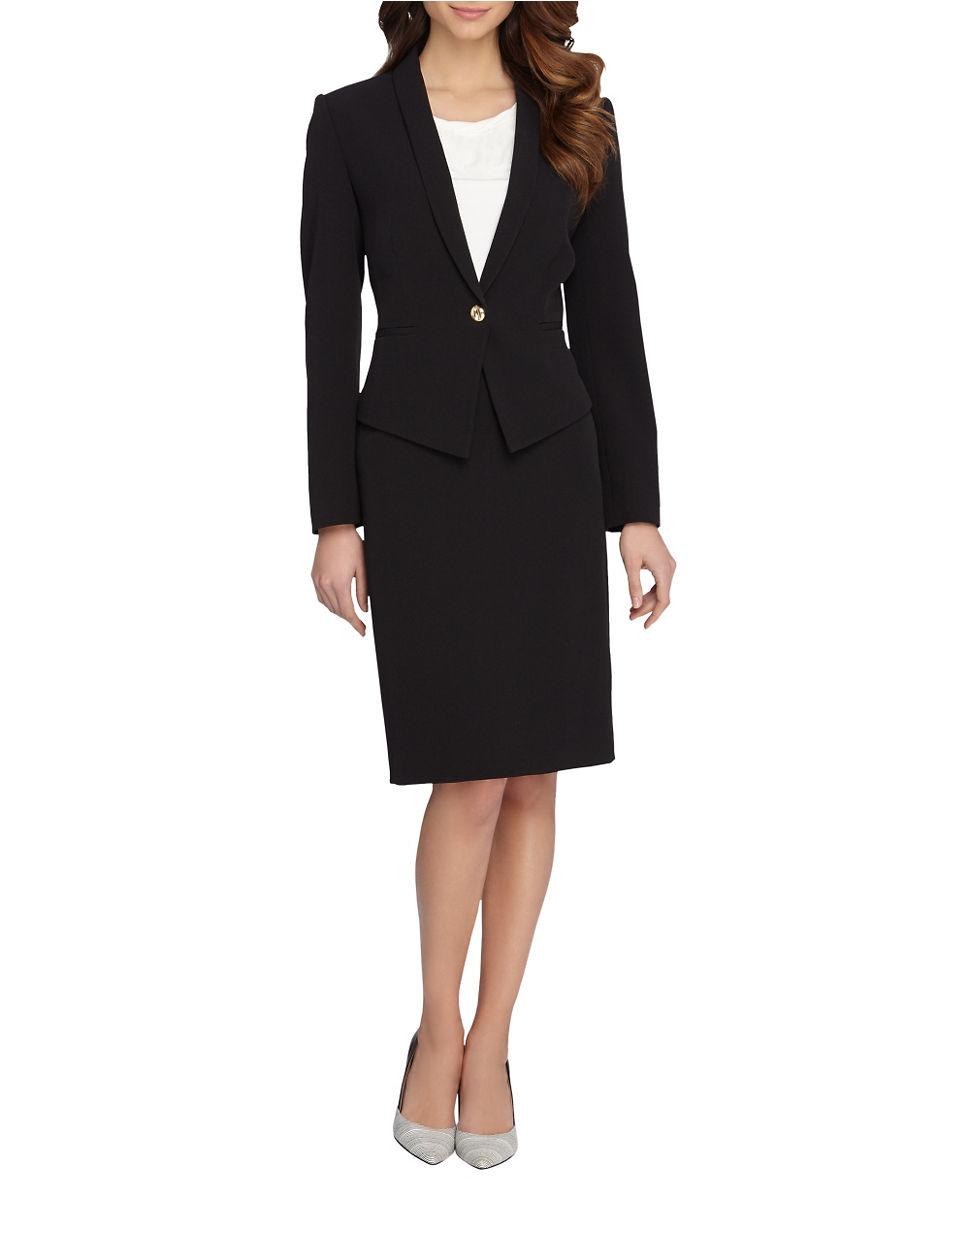 Tahari Plus 2-piece Jacket And Skirt Set in Black | Lyst